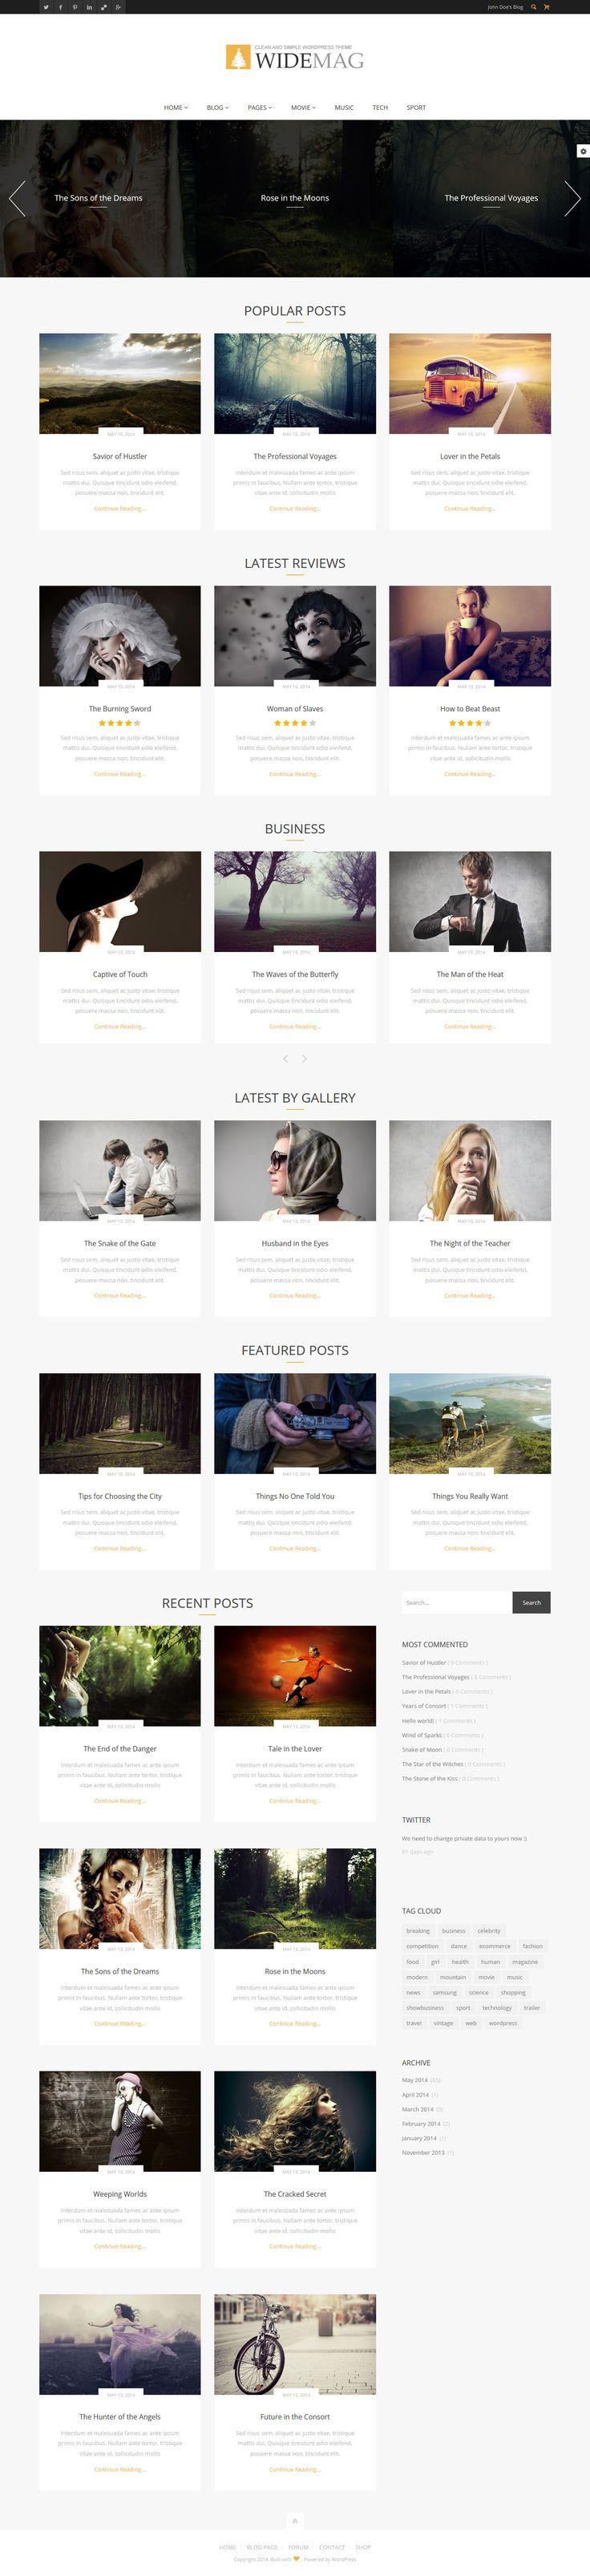 Widemag - Wordpress Magazine Theme #wordpress #magazinetemplate Live Preview and Download: http://themeforest.net/item/widemag-wordpress-magazine-theme/8377608?ref=ksioks